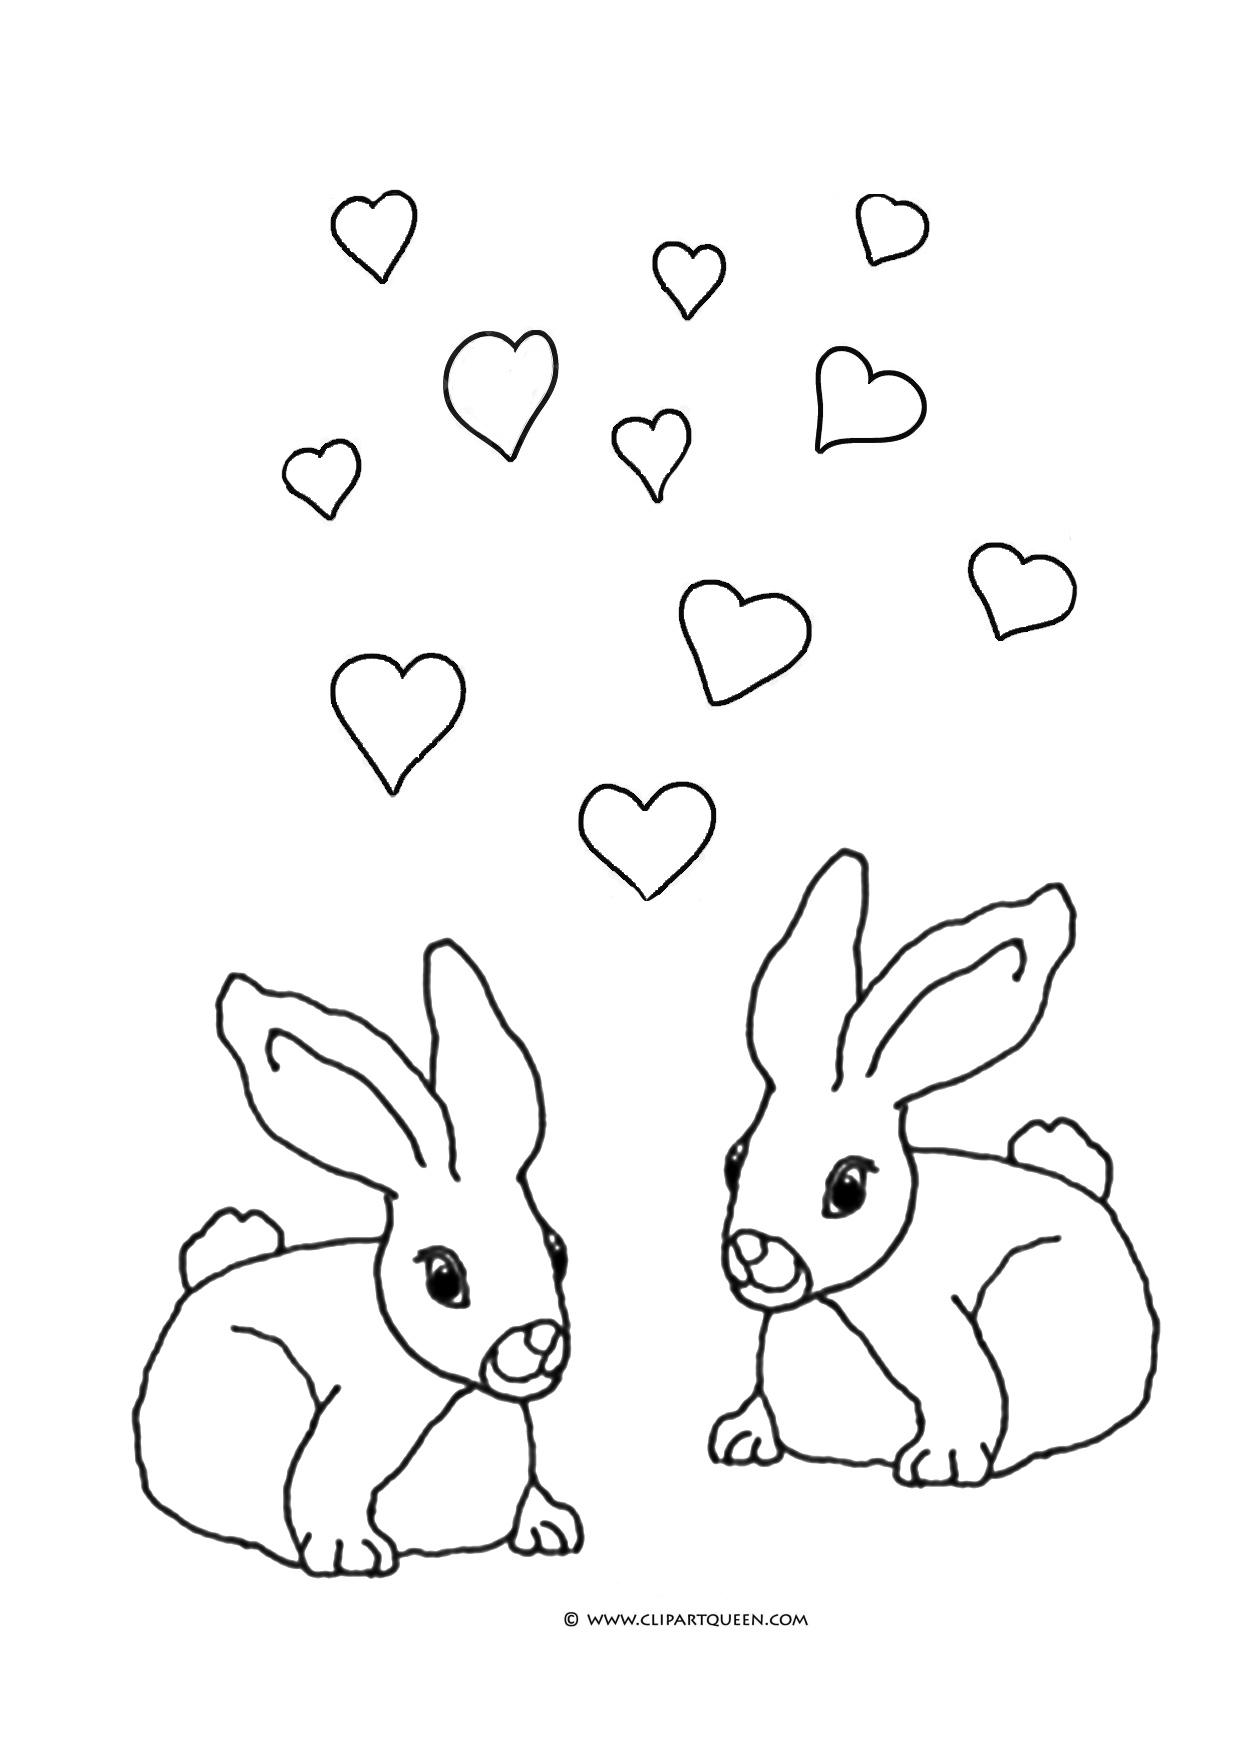 11 Valentine